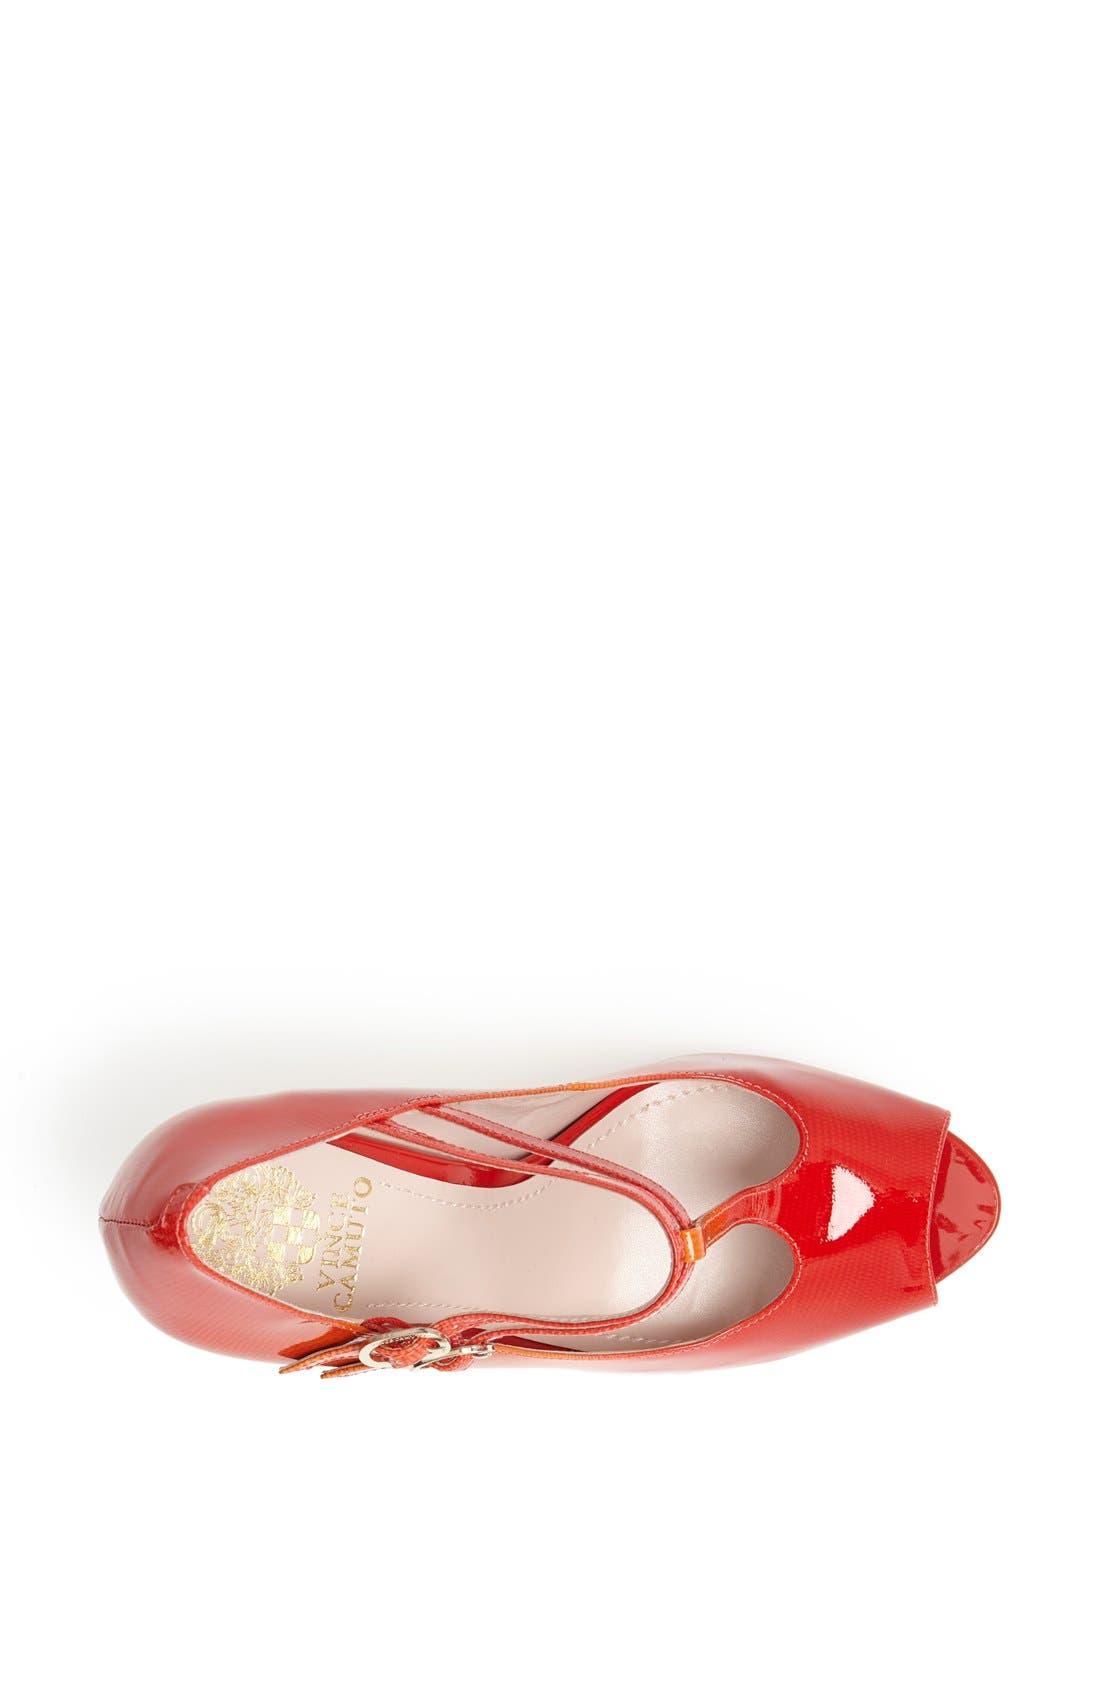 Alternate Image 3  - Vince Camuto 'Carlii' Patent Leather Peep Toe Pump